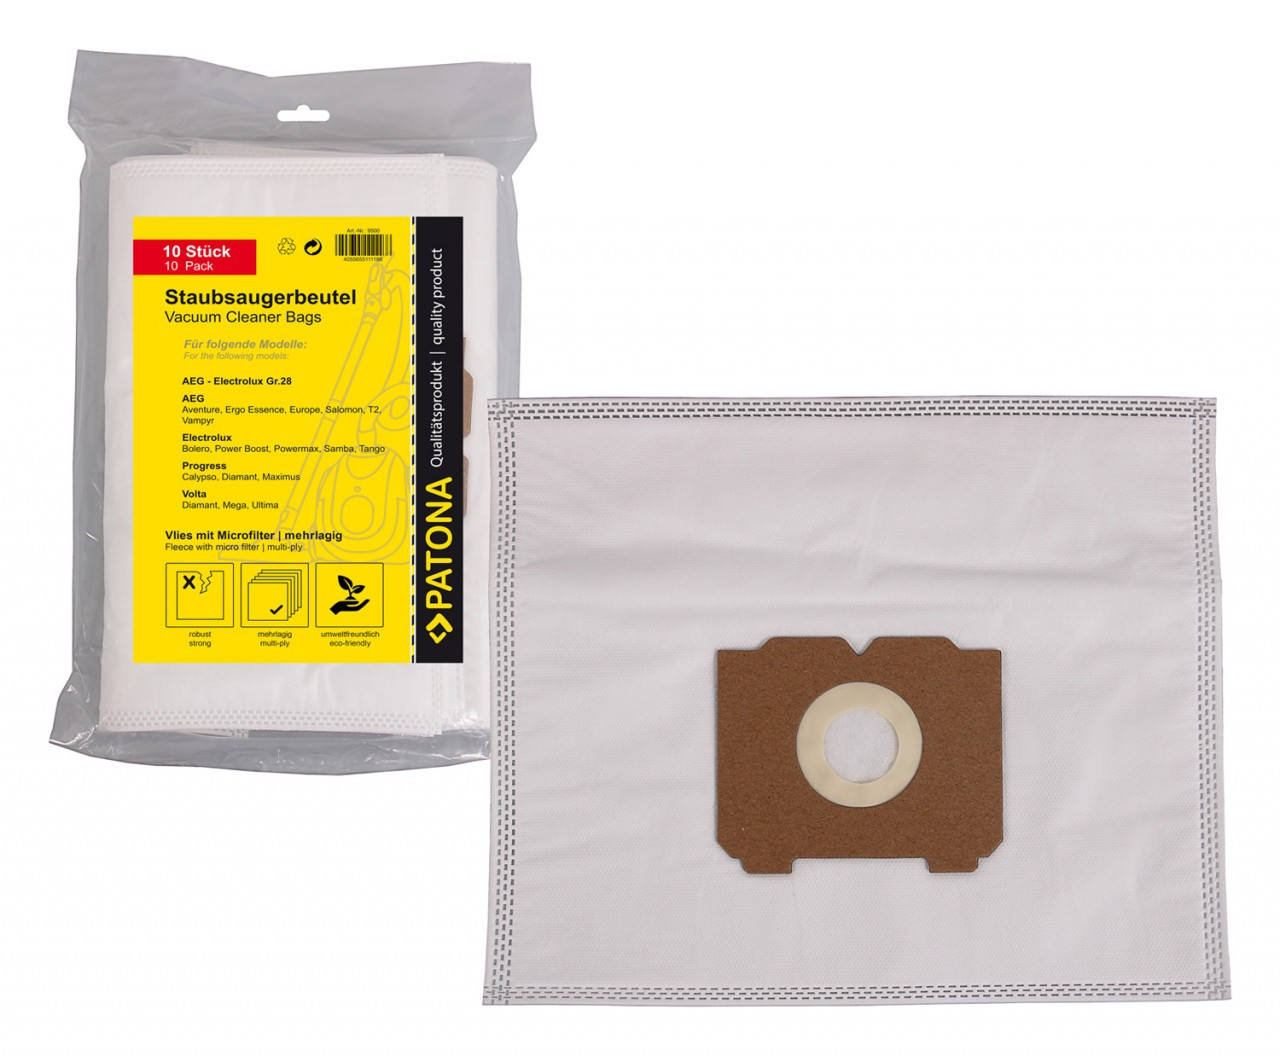 PATONA 10 STOFZUIGER bag multilayer fleece incl. Microfilter